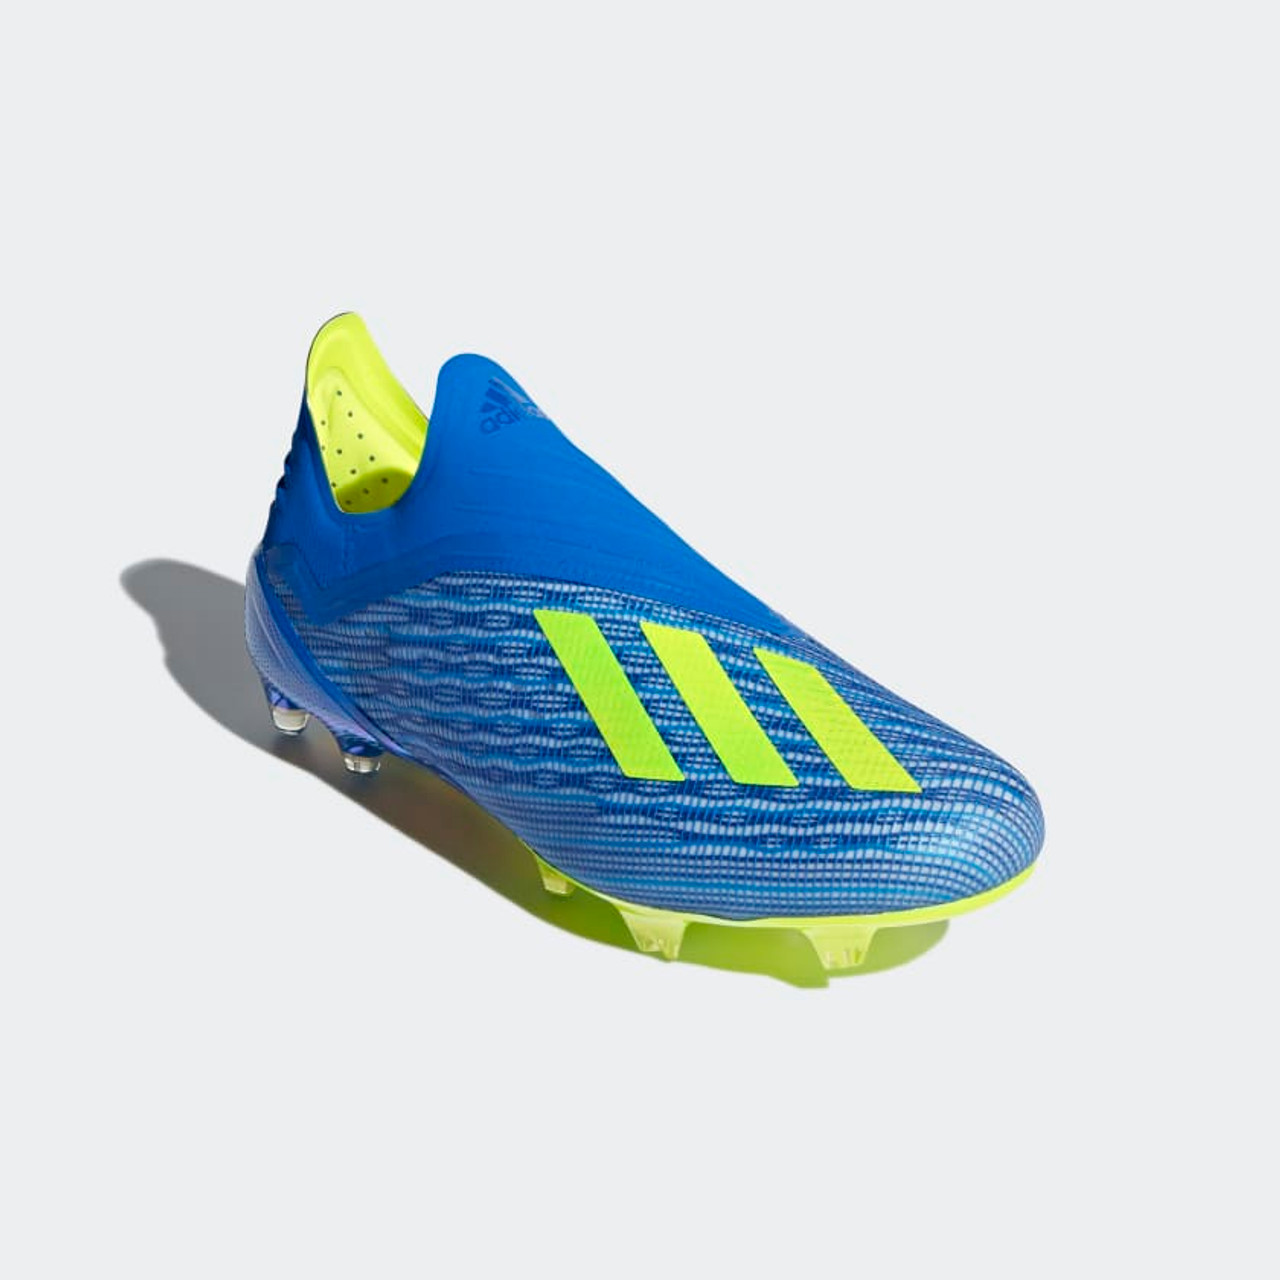 849911f0418 ADIDAS X 18+ FG Cleats Blue solar yellow - Soccer Plus